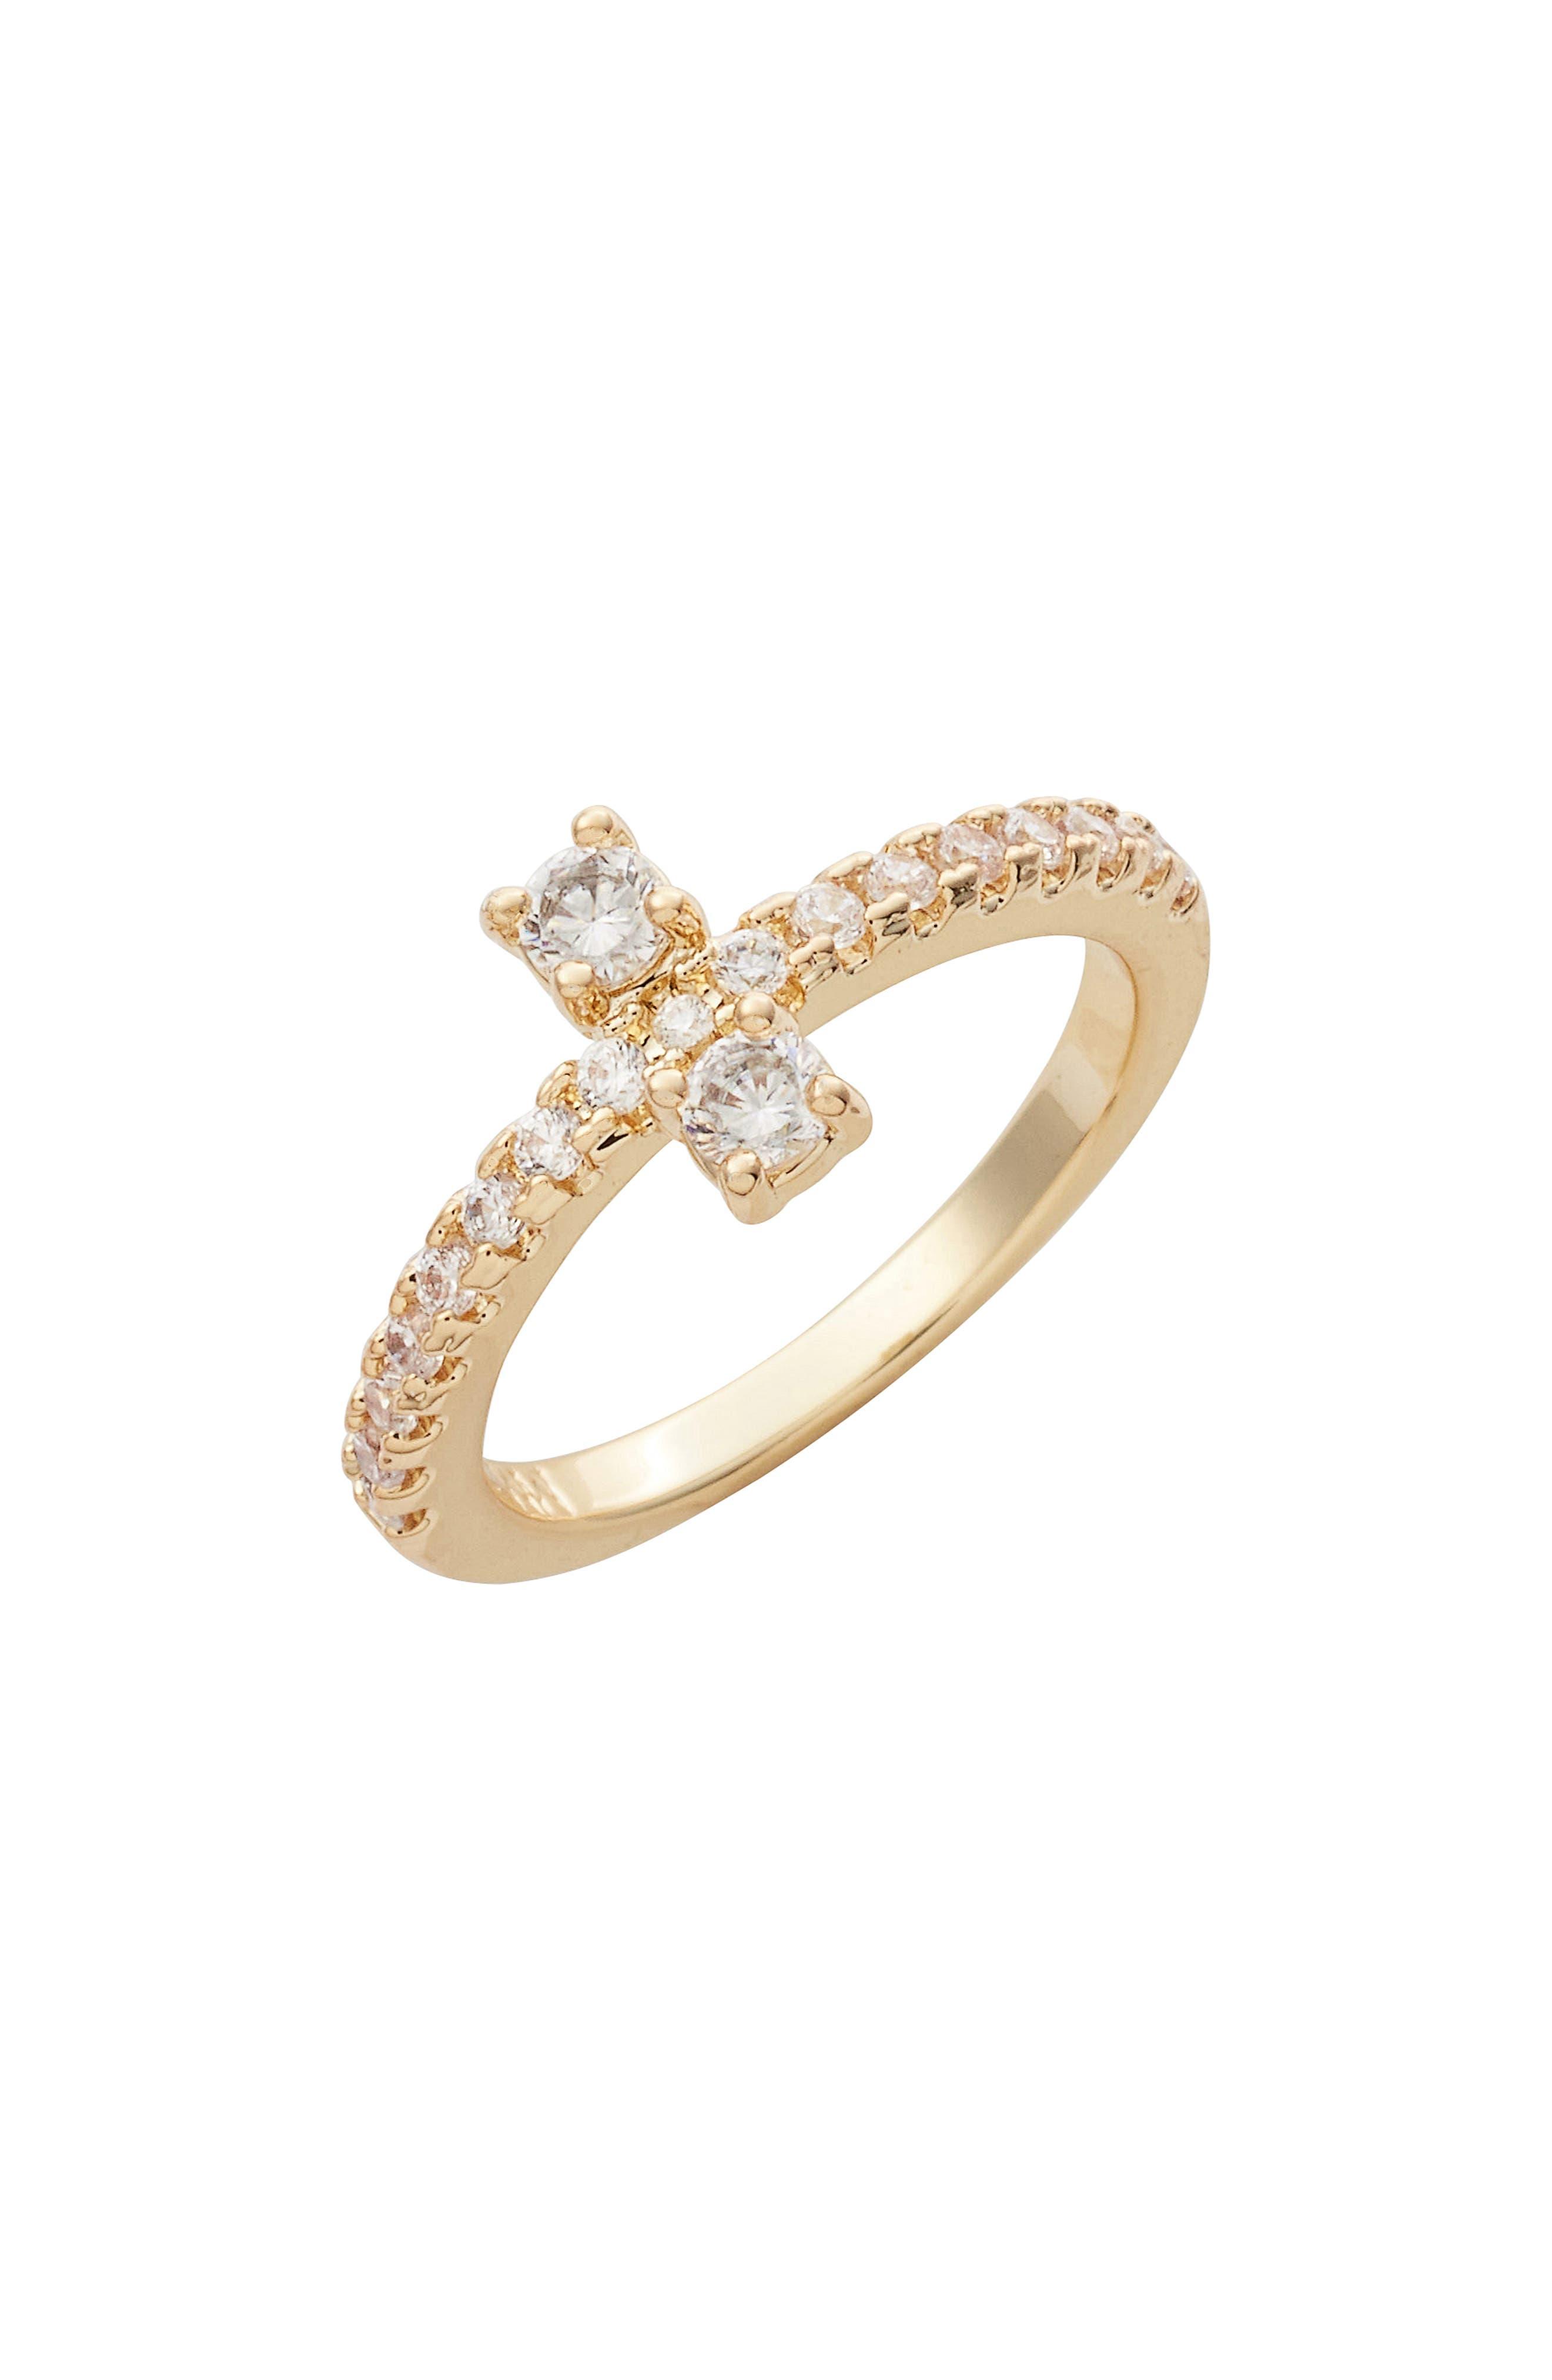 Main Image - Melinda Maria Margaret Cluster Ring